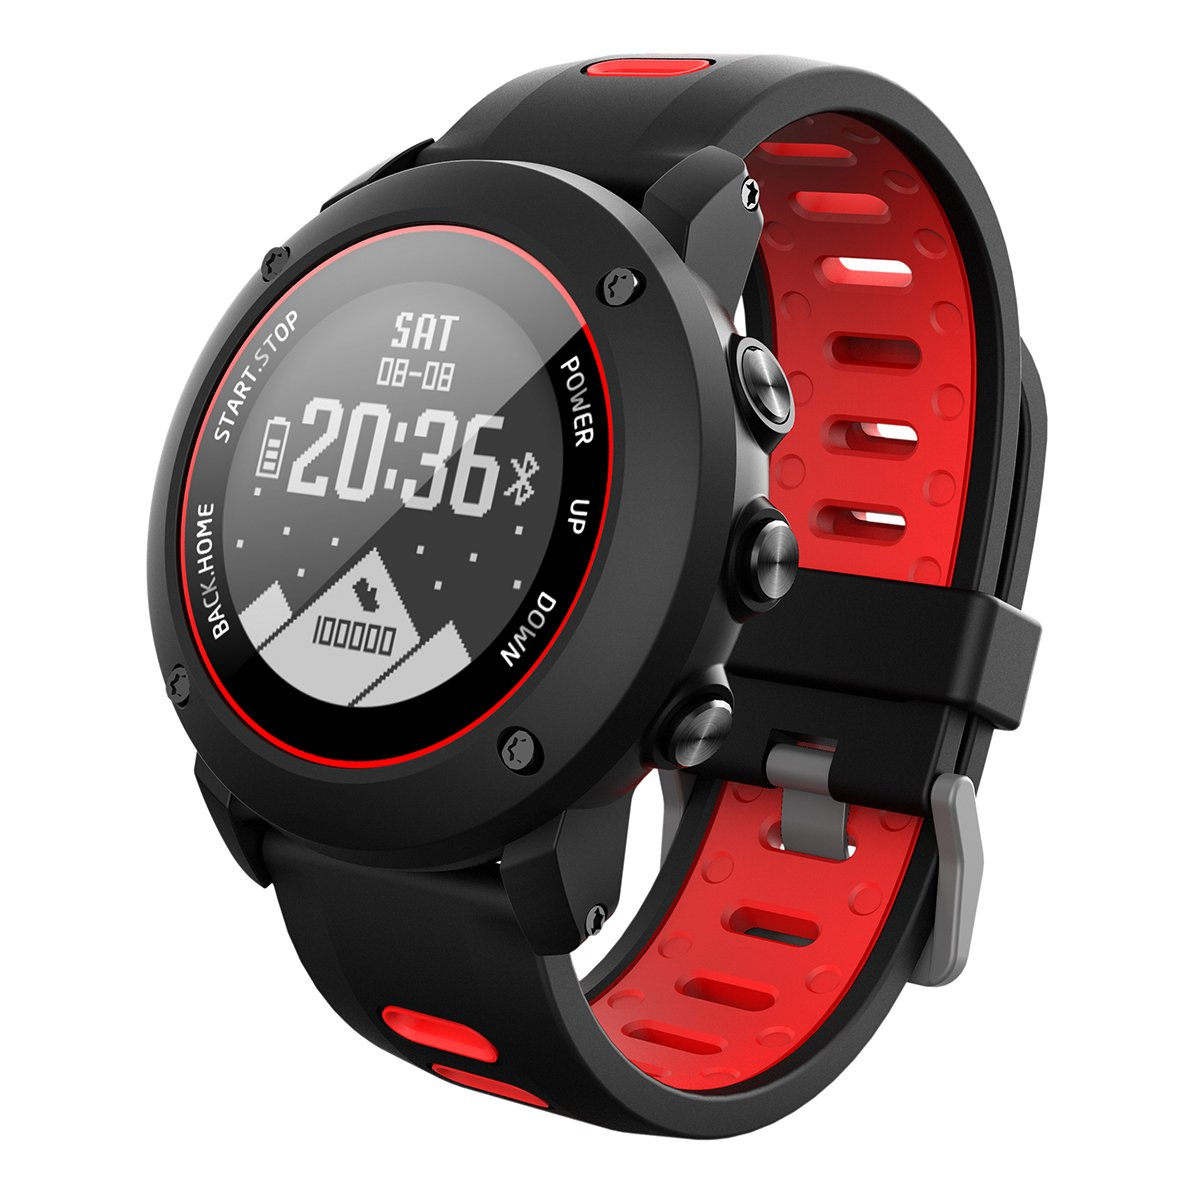 OOLIFENG GPS スポーツスマートウォッチ フィットネストラッカー 高度計 気圧計 コンパス 心拍数モニター IP68 防水デジタルウォッチ アウトドアスポーツ用  レッド B07KBYCTMT